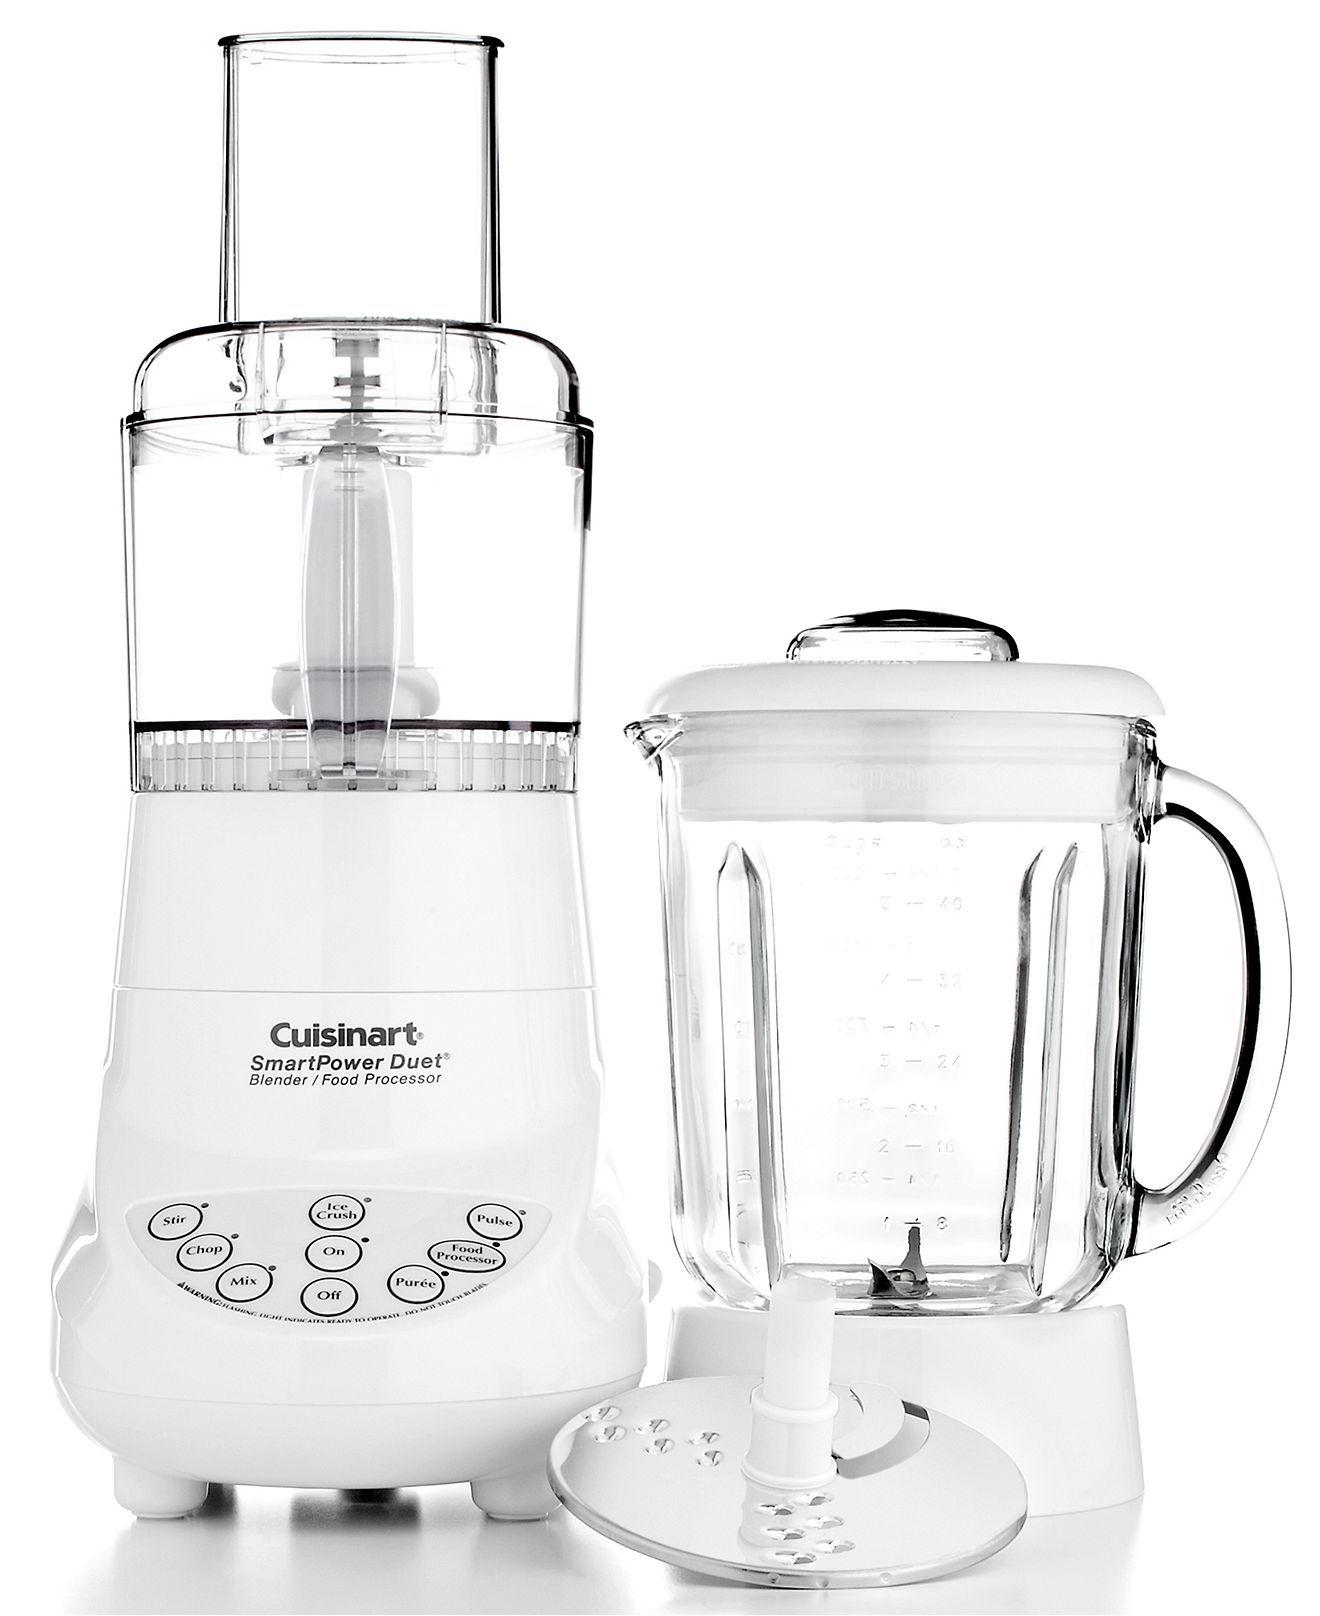 Cuisinart blender food processor got the blender